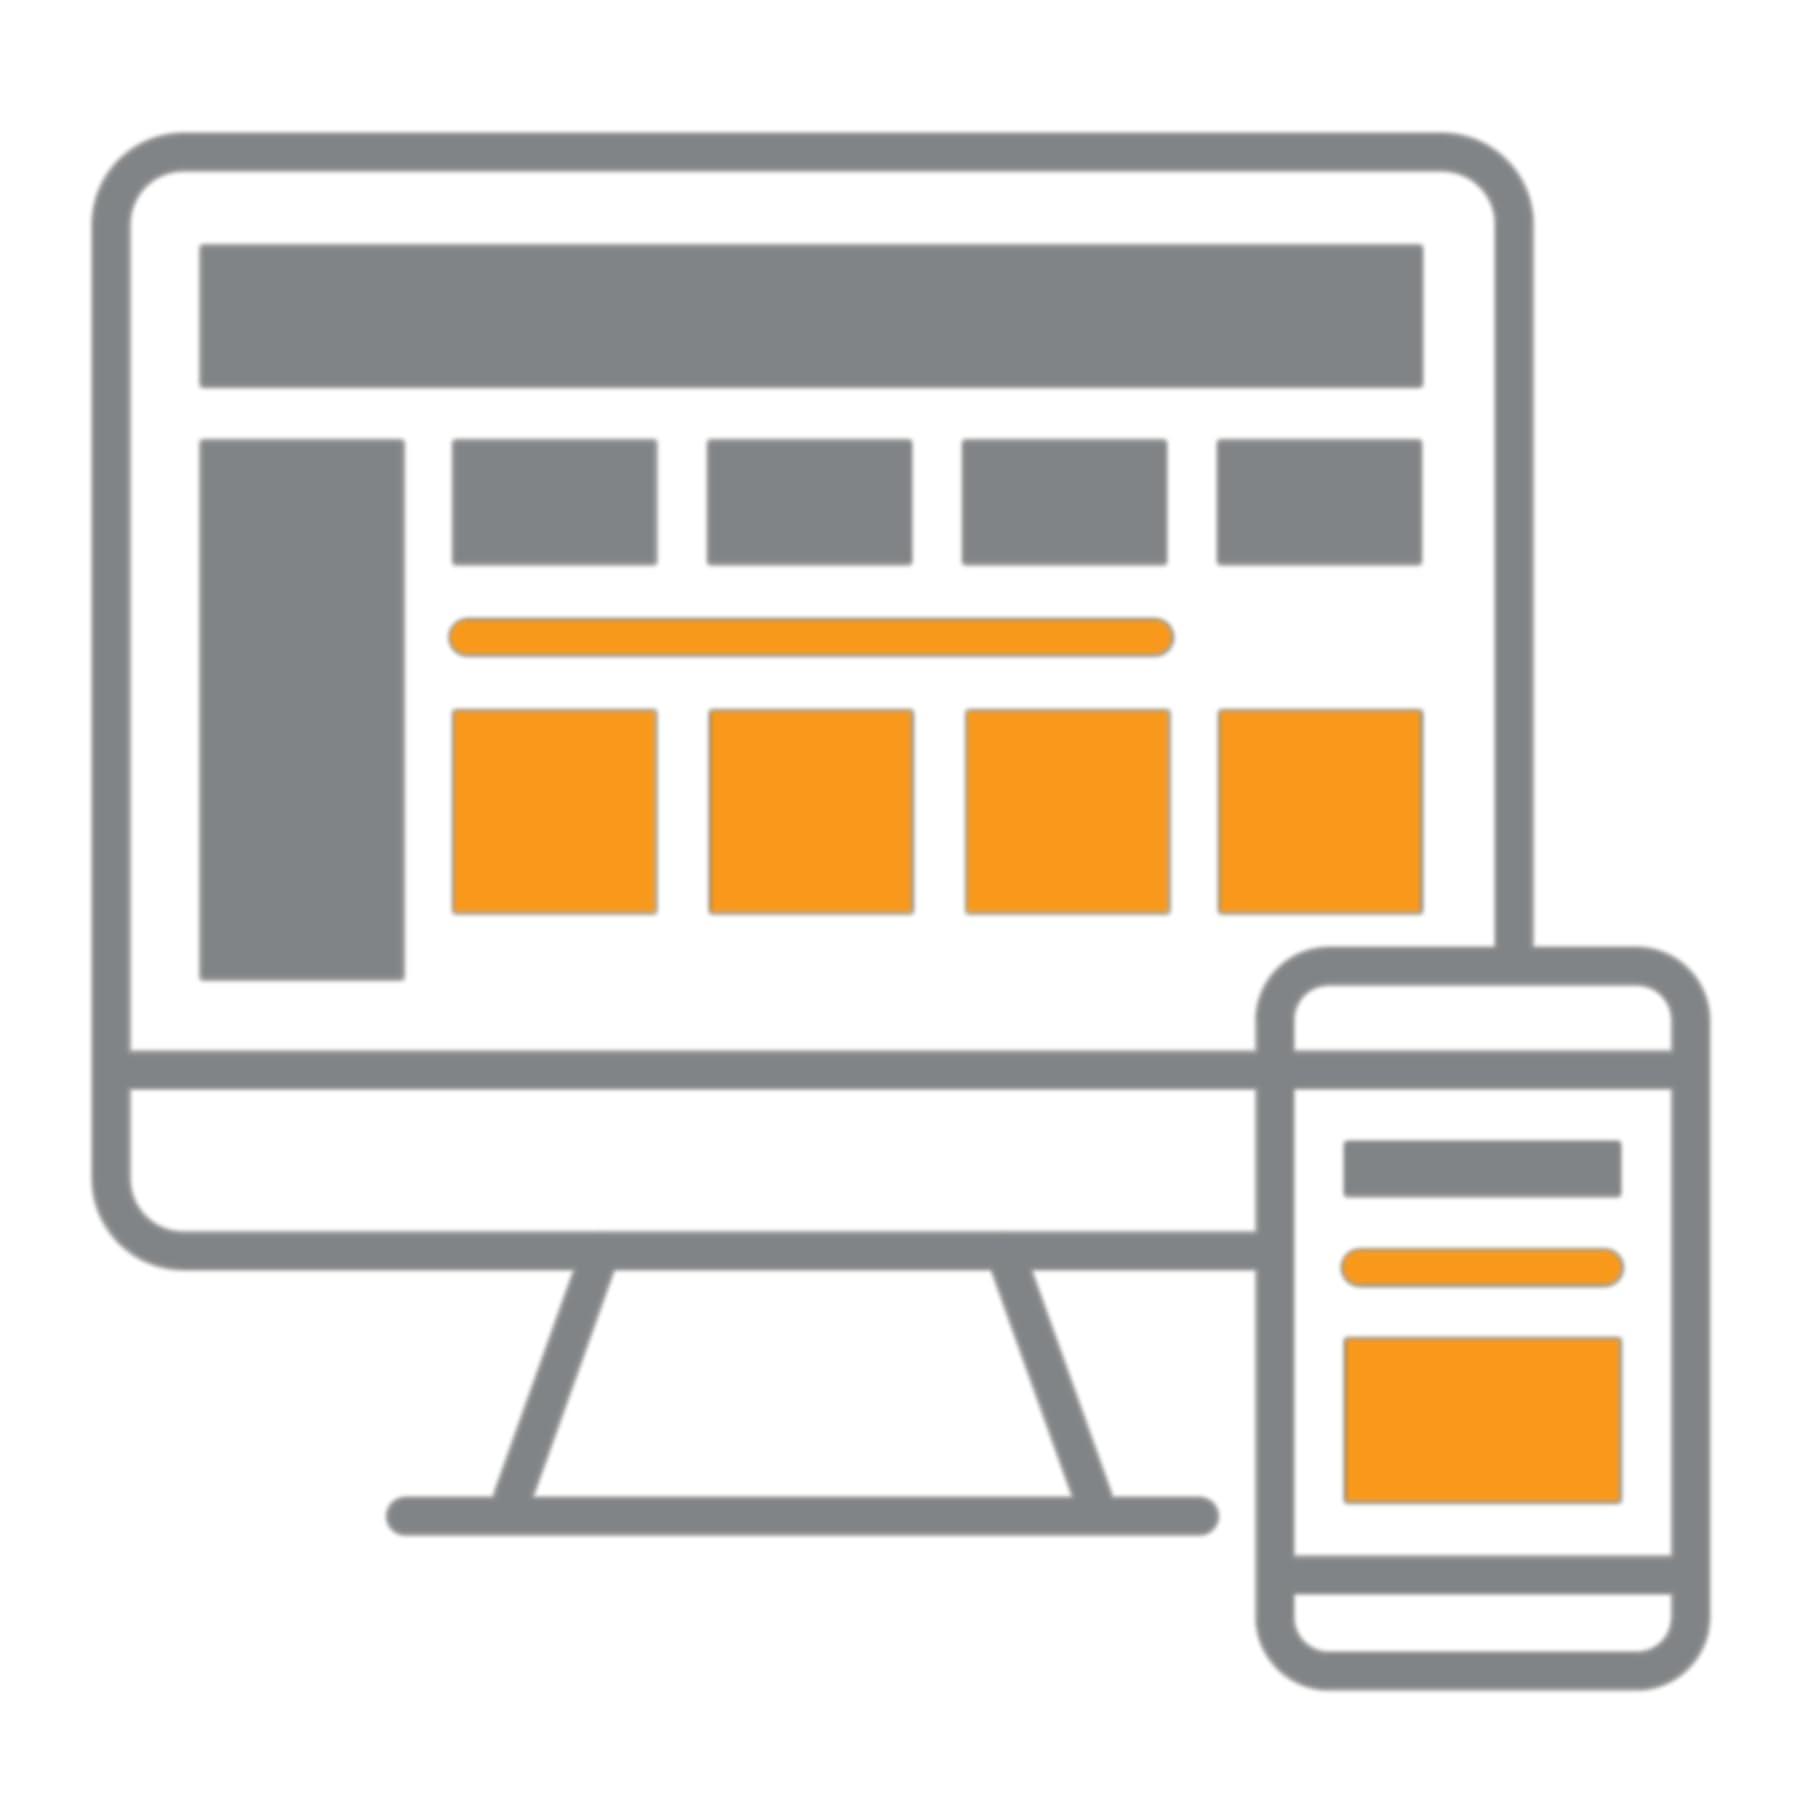 "{""blocks"":[{""key"":""6ngik"",""text"":""Placement degli annunci Sponsored Brands su desktop e dispositivi mobili"",""type"":""unstyled"",""depth"":0,""inlineStyleRanges"":[],""entityRanges"":[],""data"":{}}],""entityMap"":{}}"